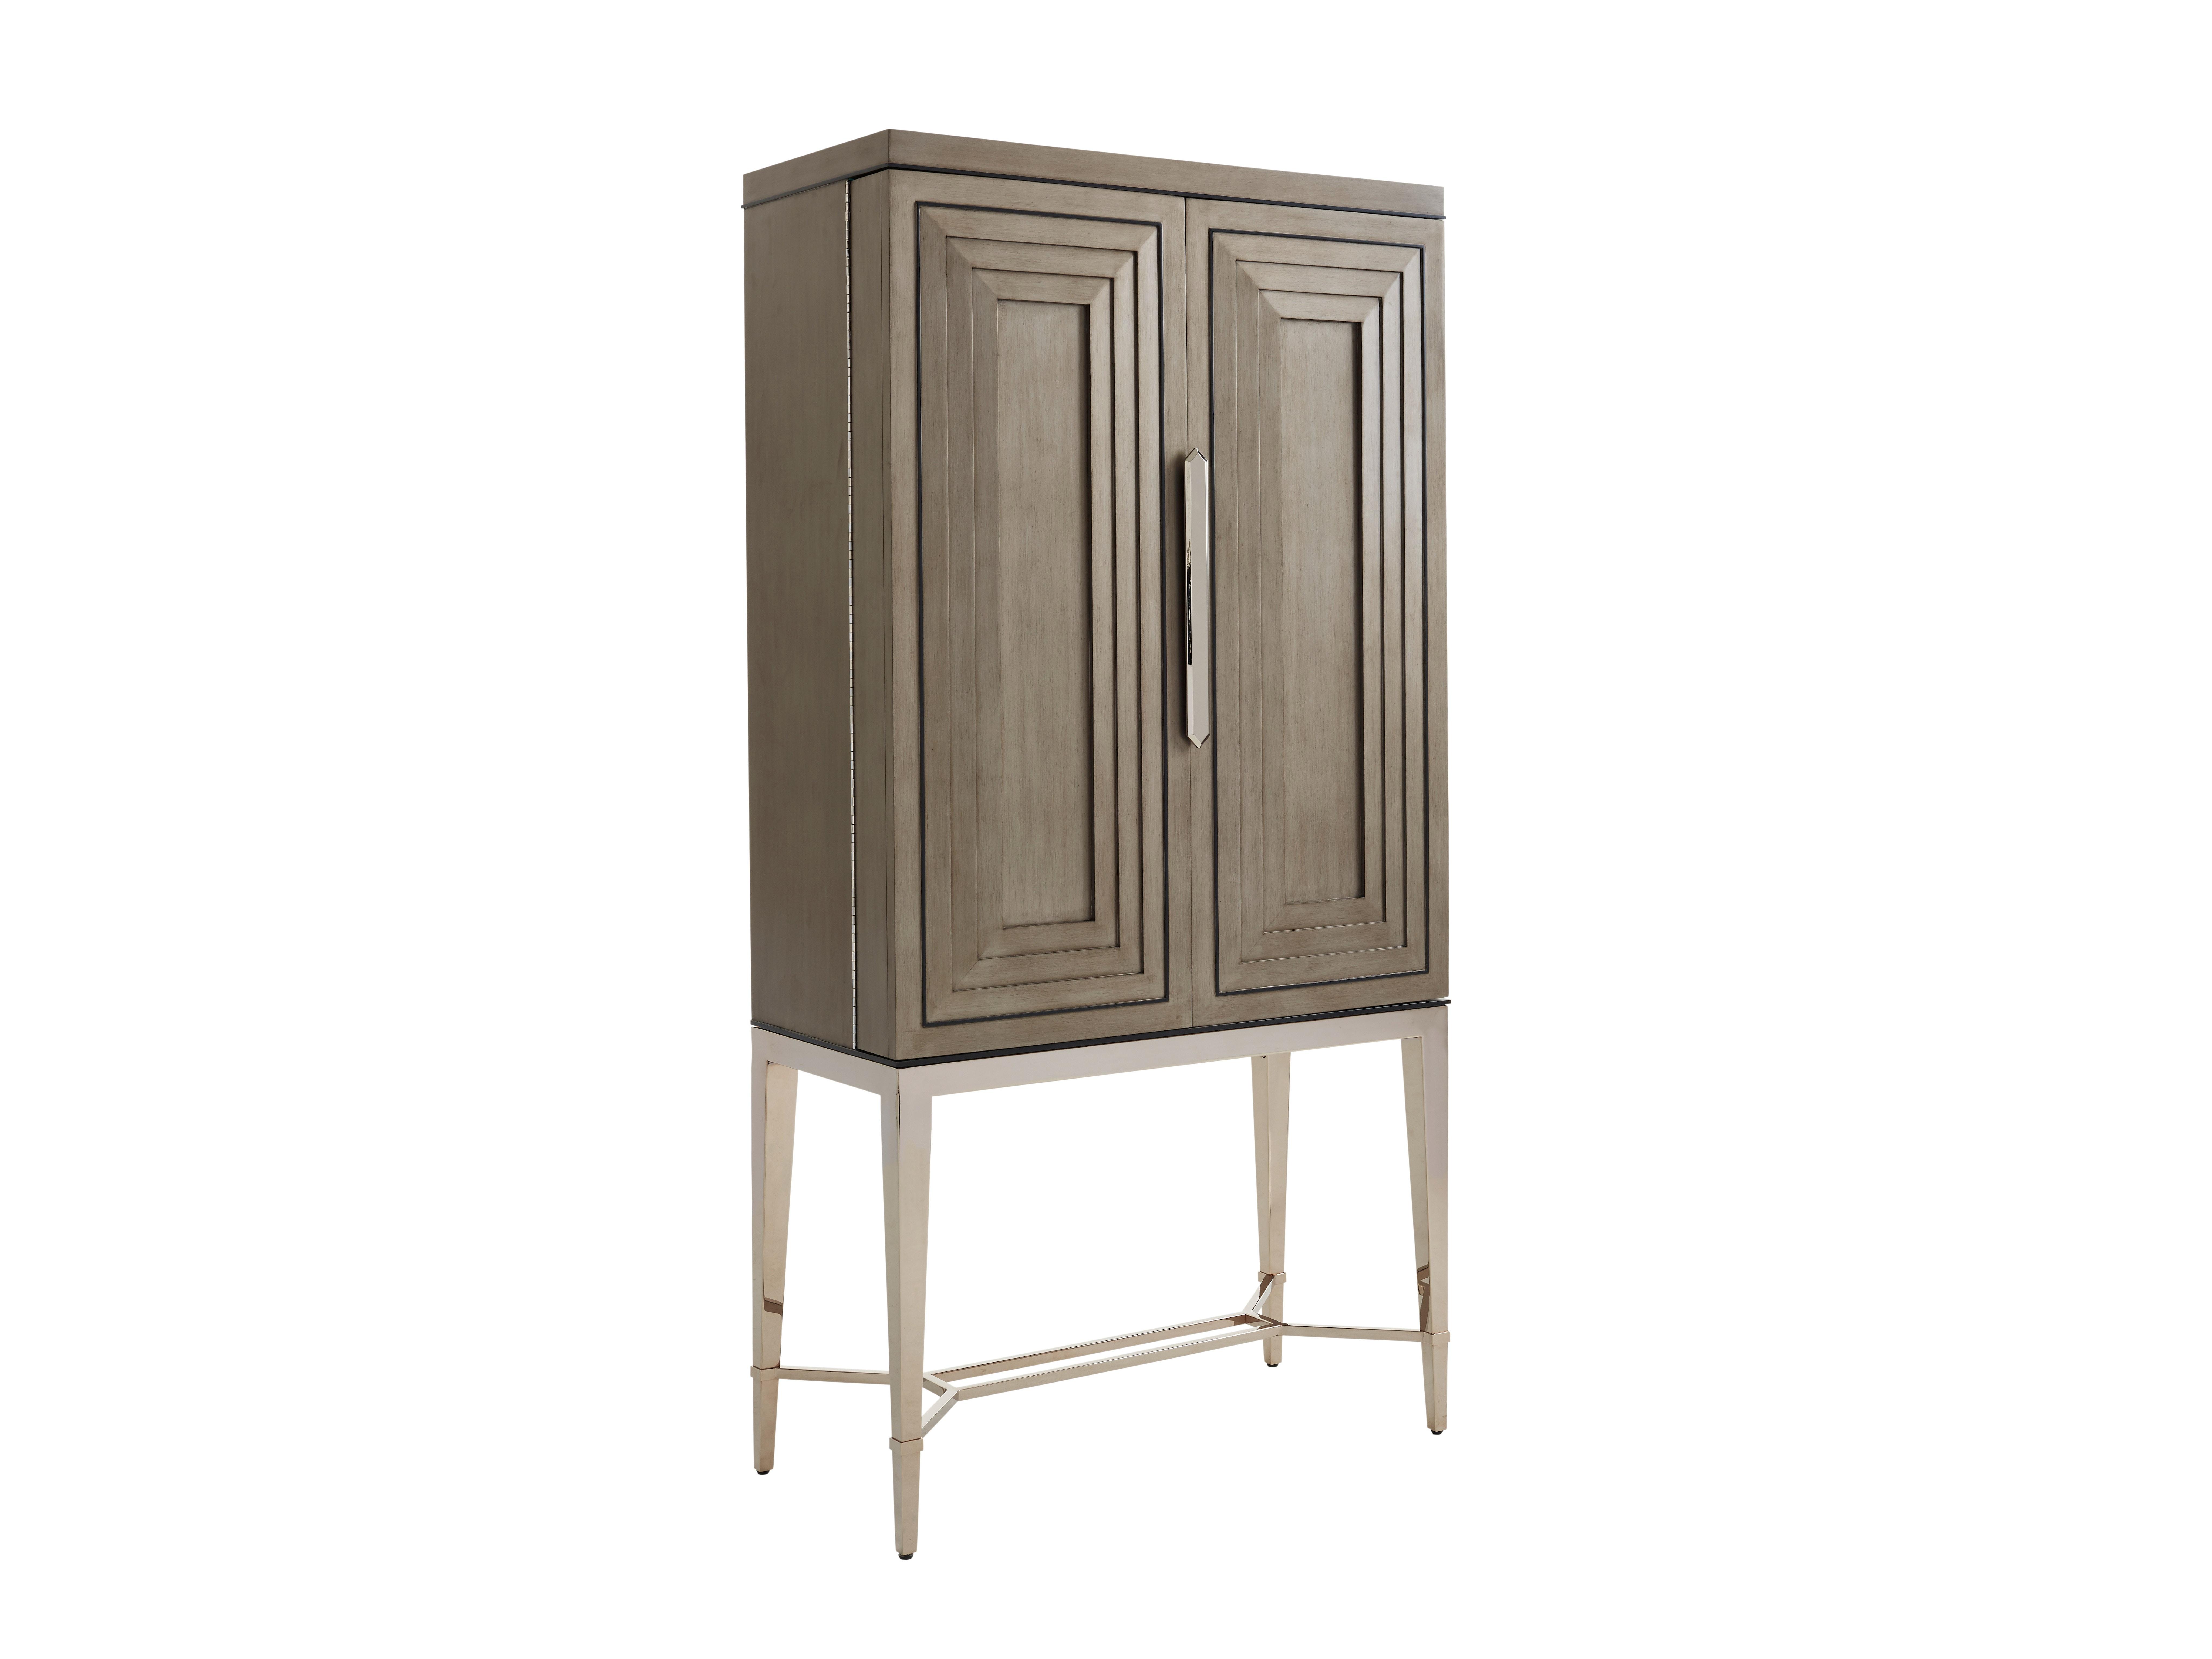 Lexington Furniture Cheval Bar Cabinet 732 961C